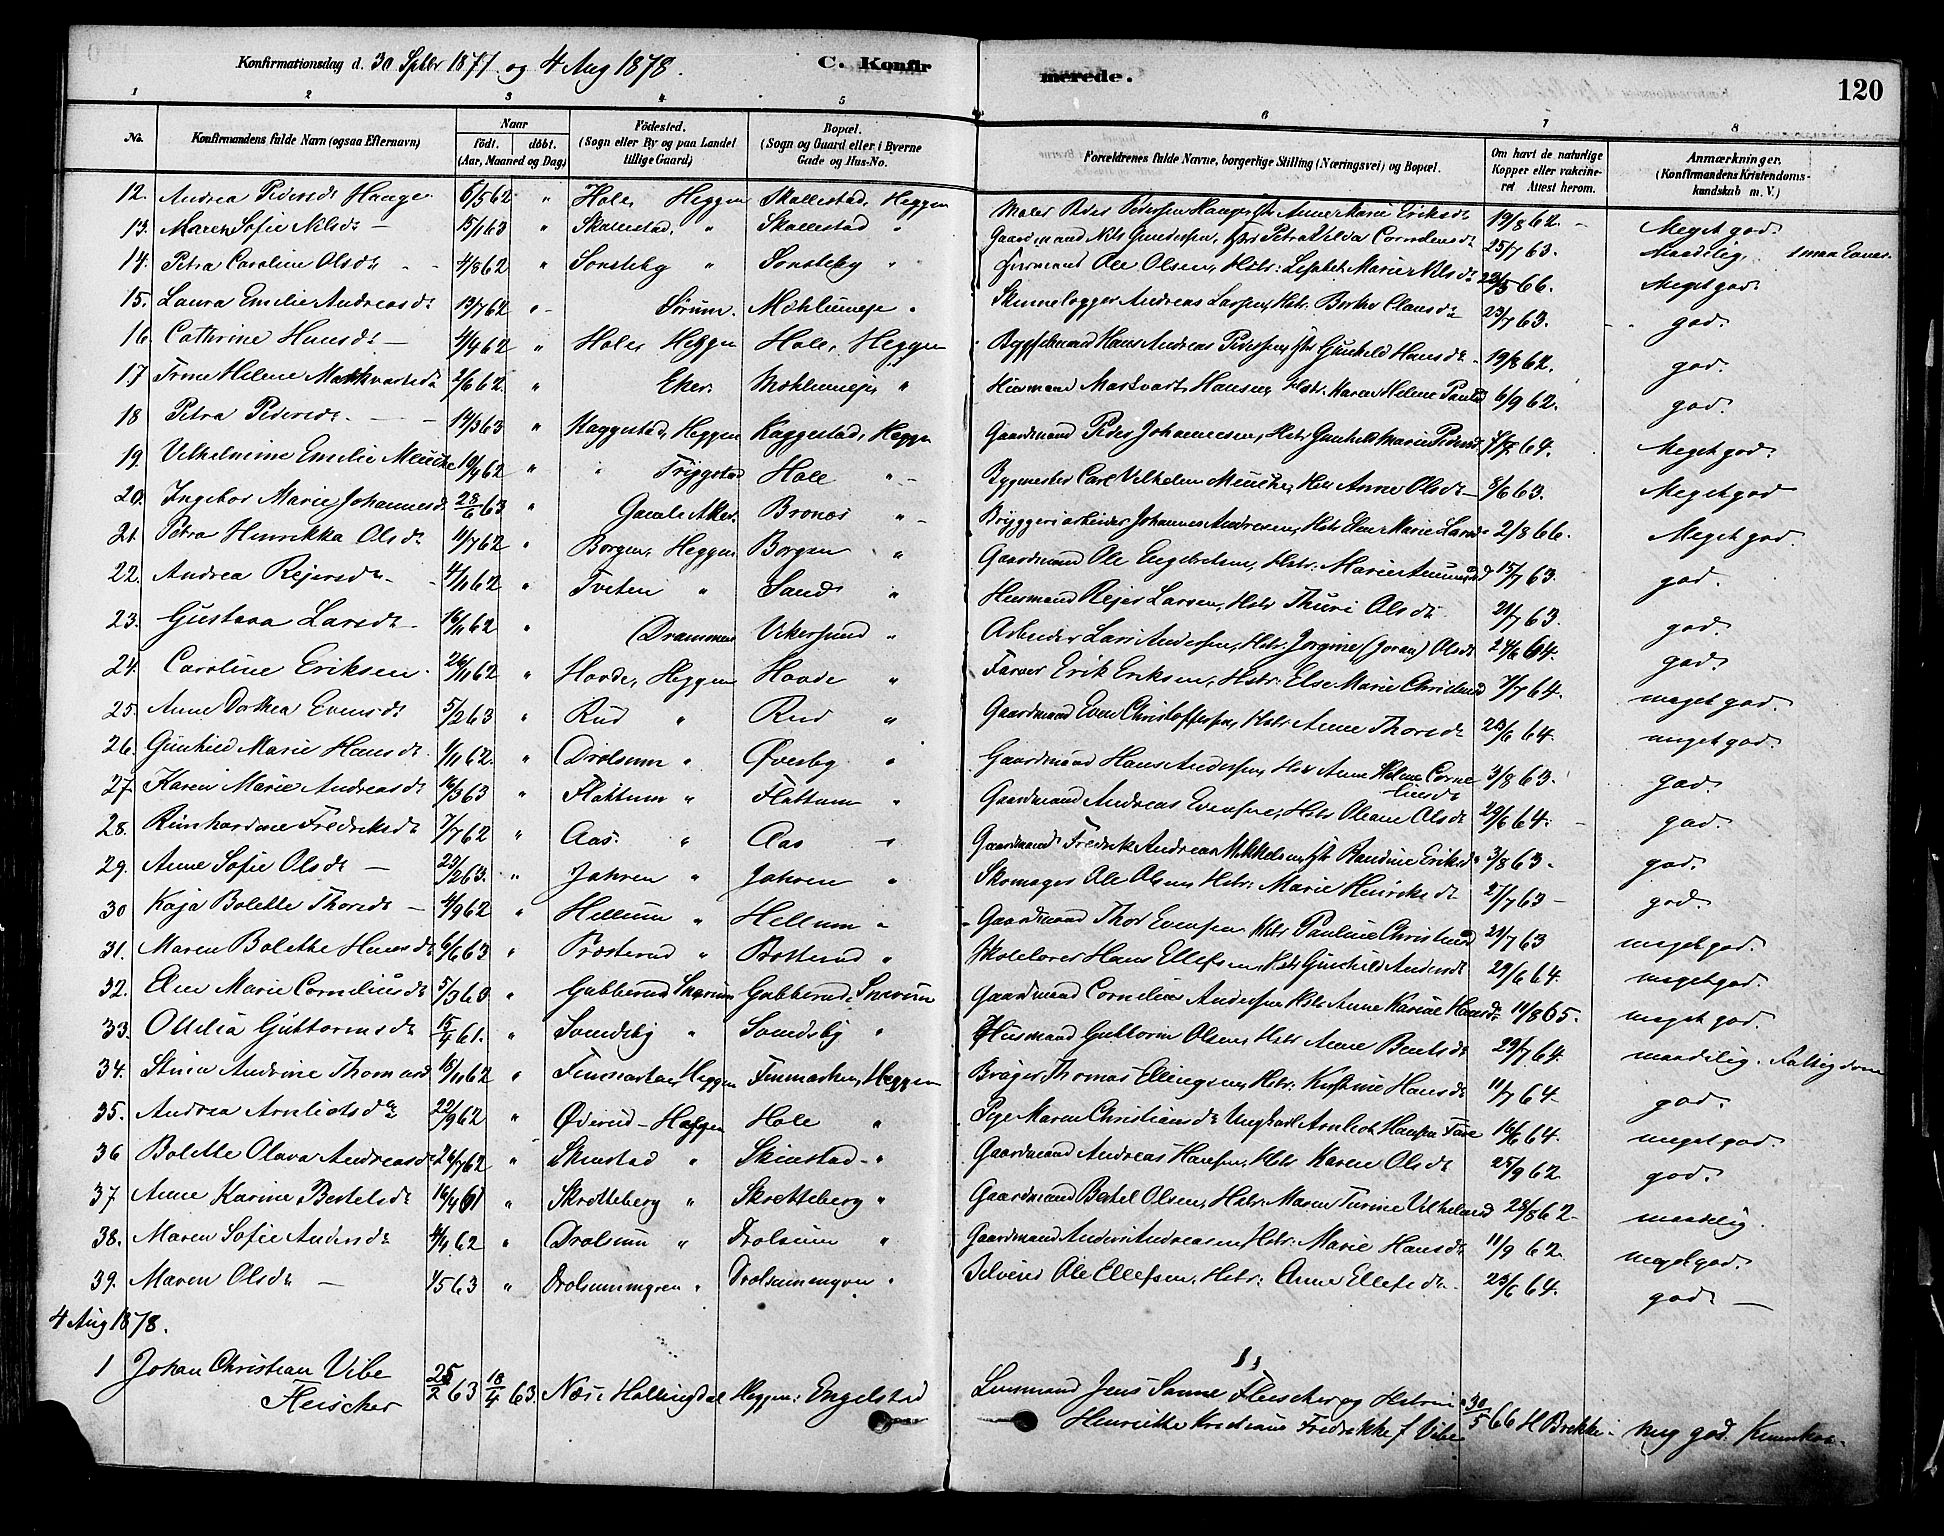 SAKO, Modum kirkebøker, F/Fa/L0011: Parish register (official) no. 11, 1877-1889, p. 120